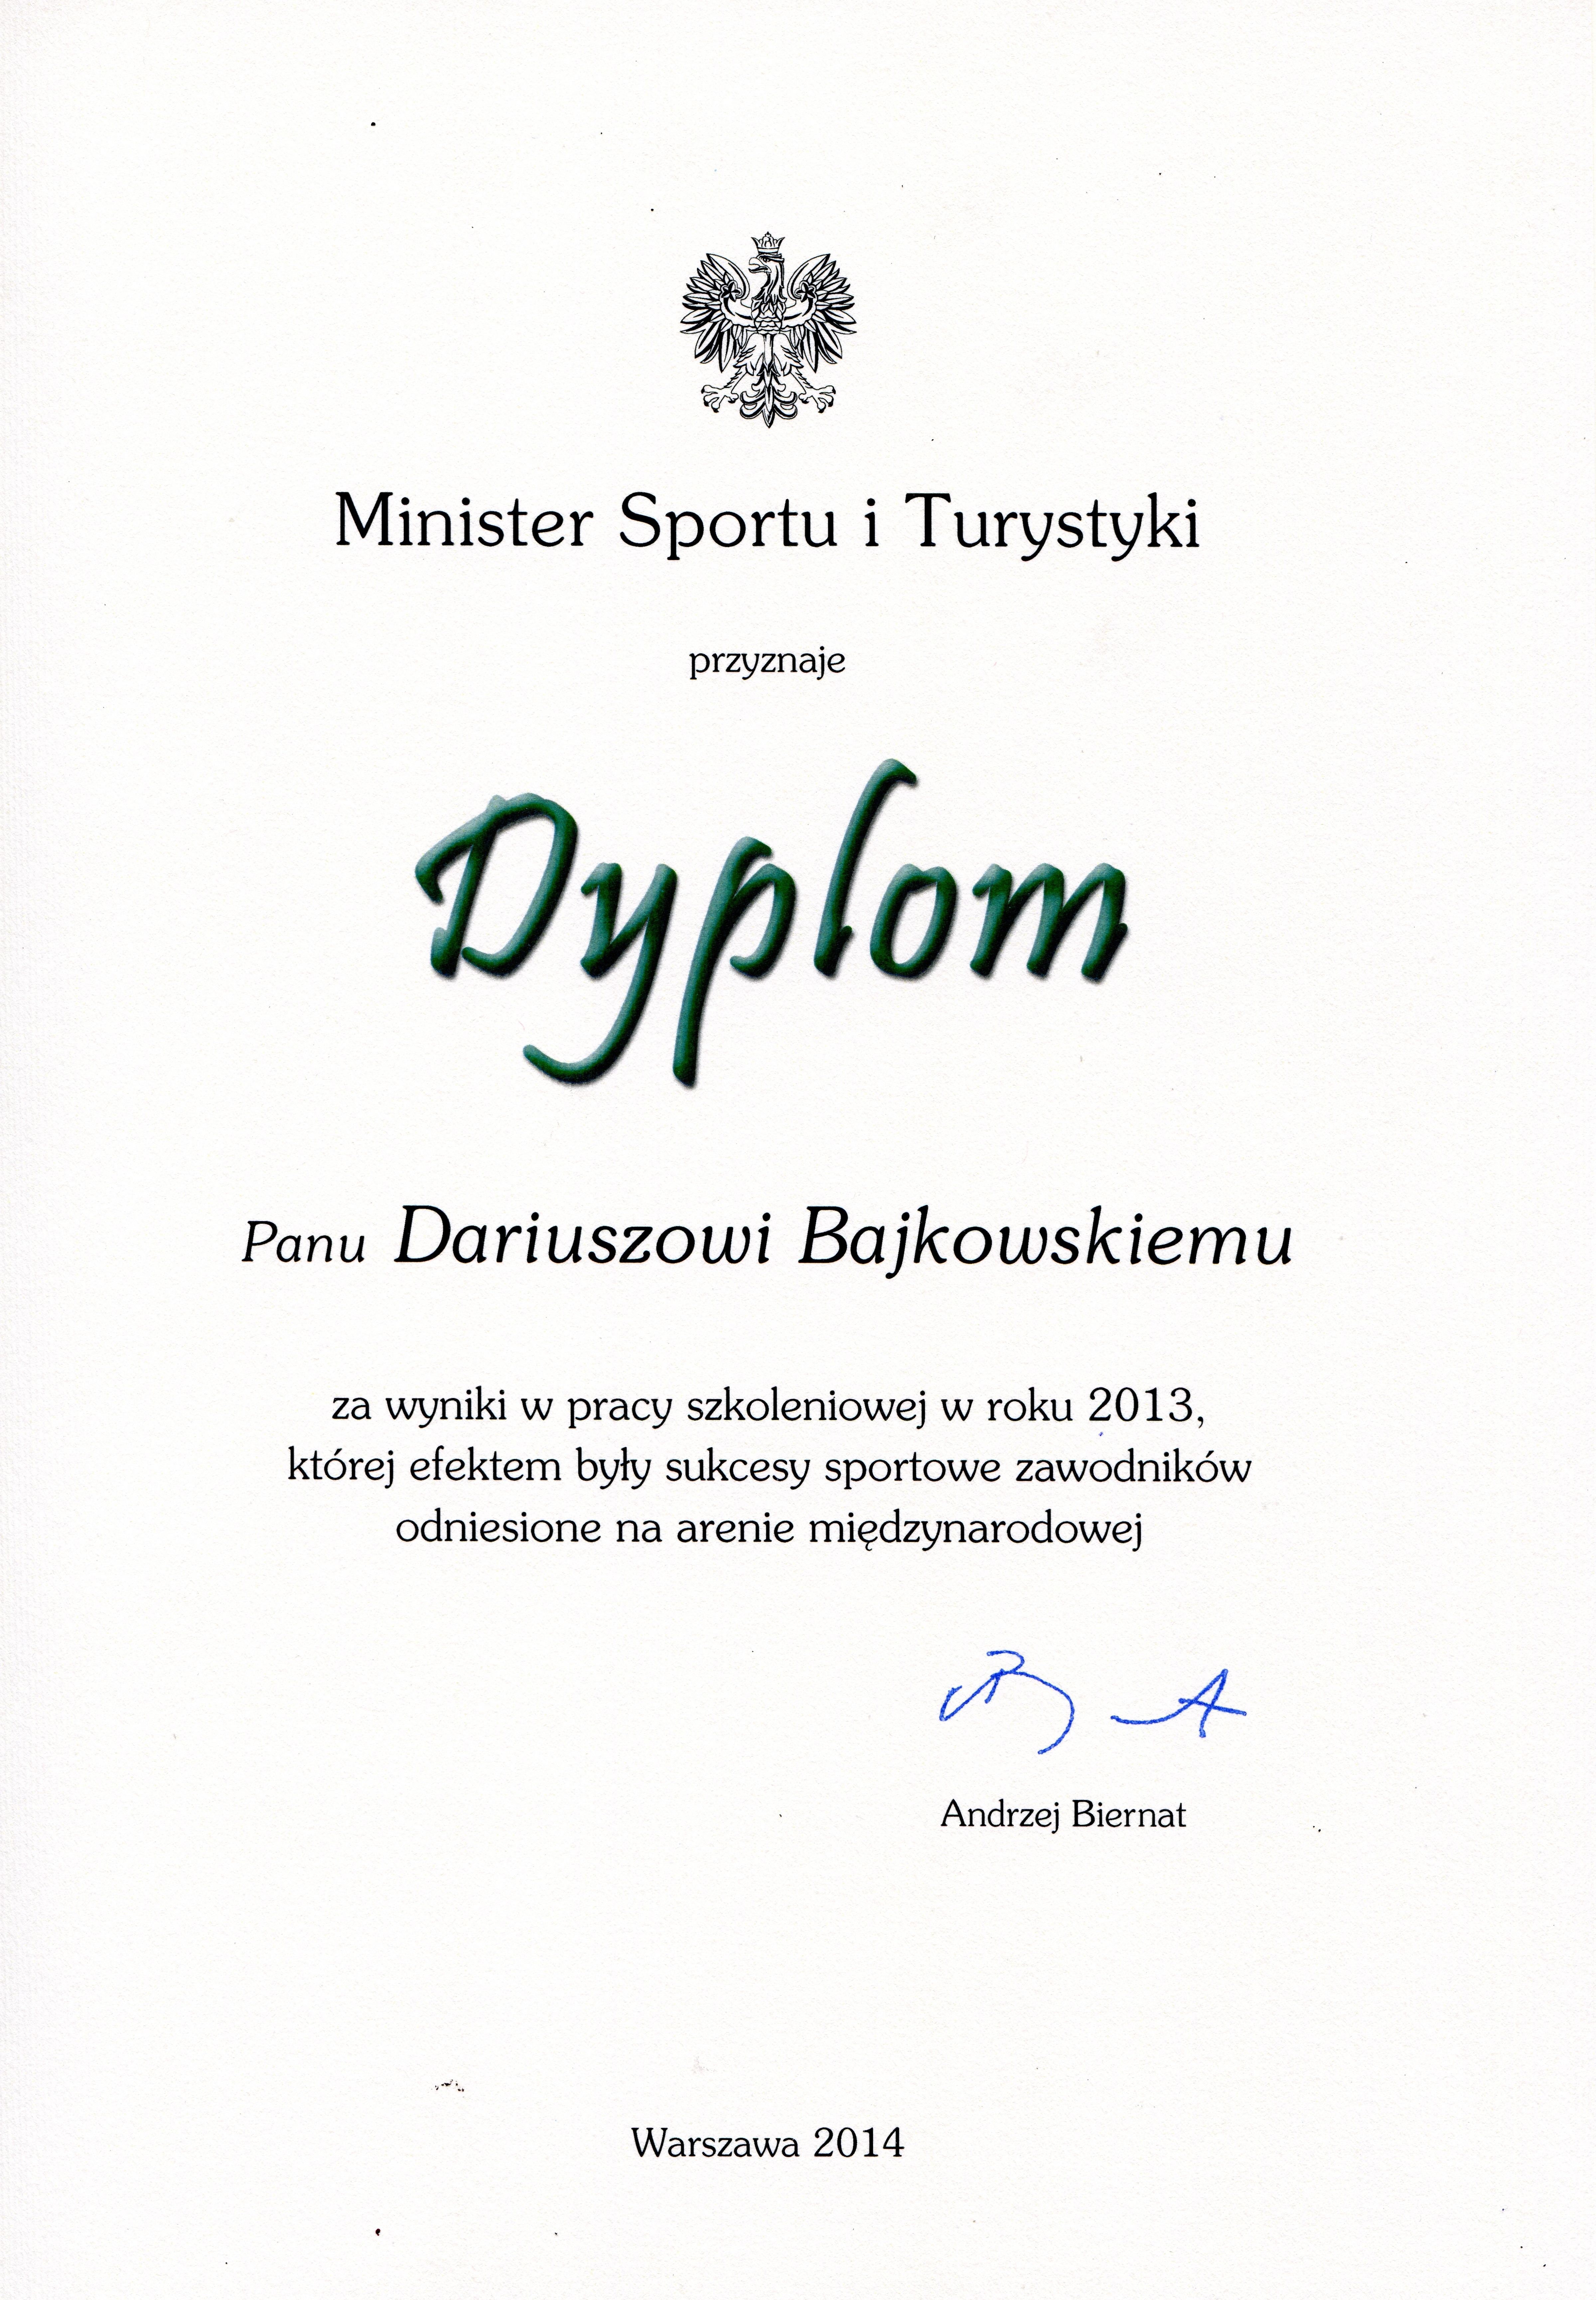 Dariusz-Bajkowski-MSiT dyplom-2014